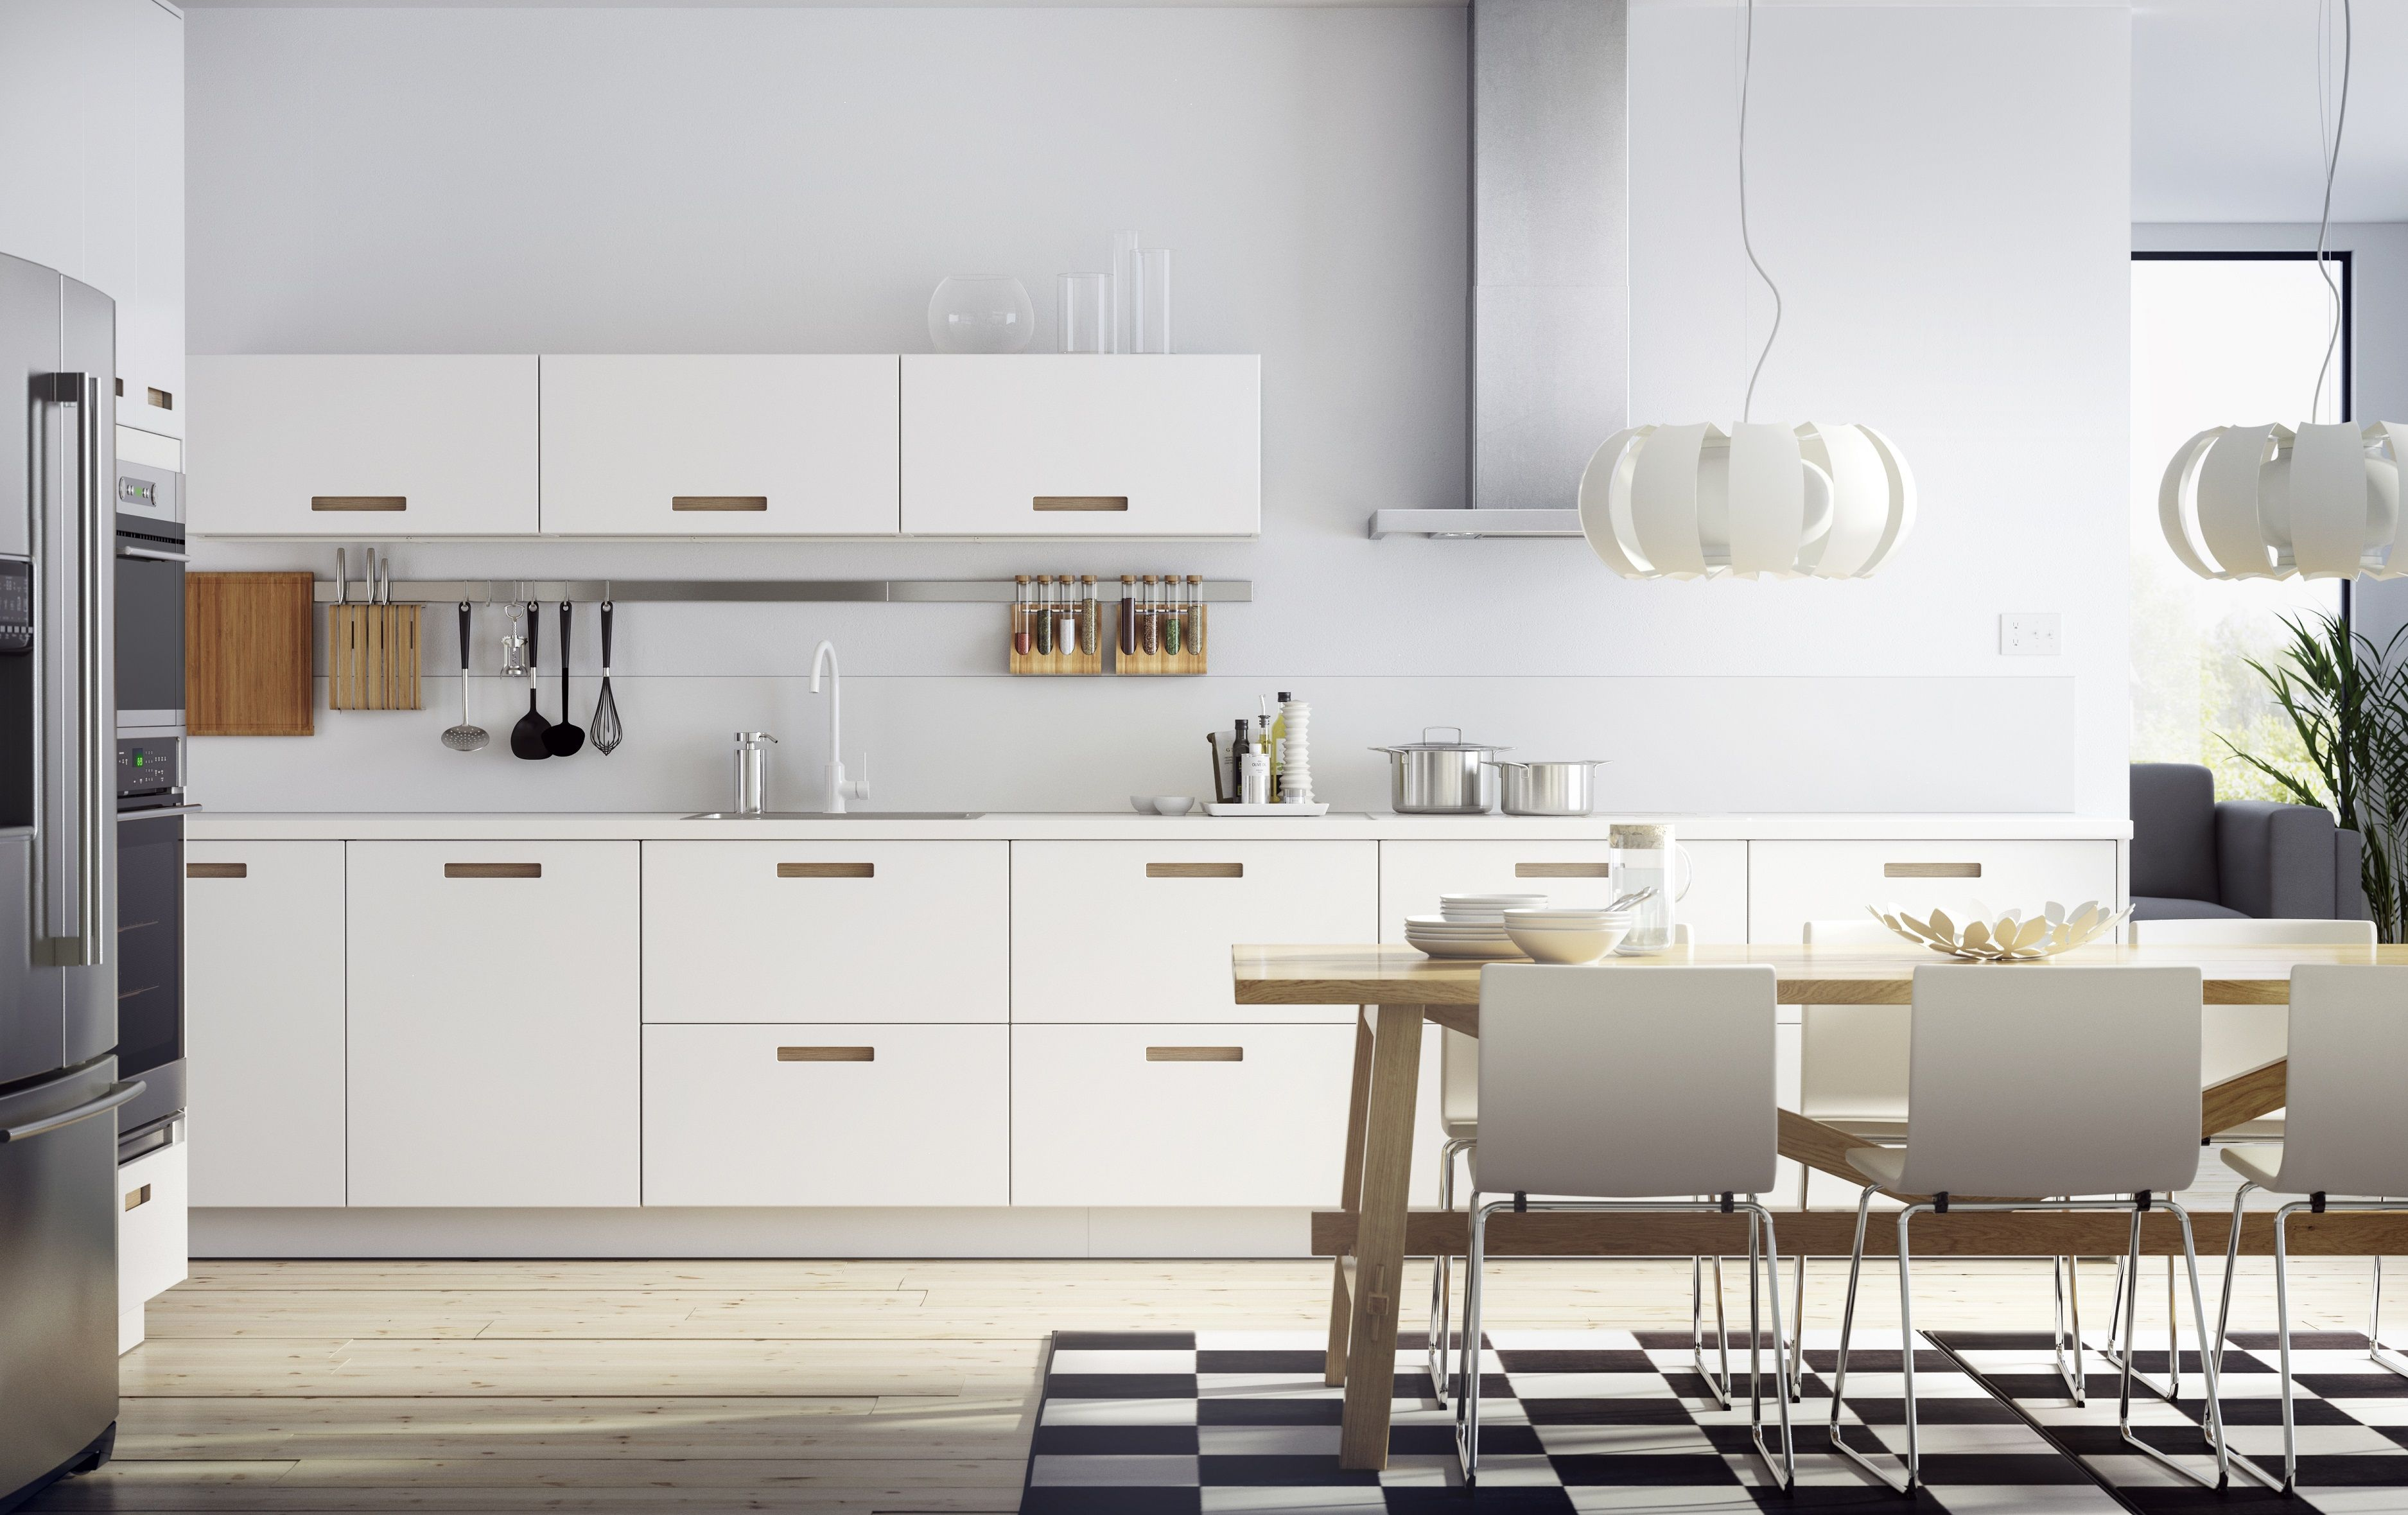 Metod Keuken Ikea : Ikea caisson metod metod keuken ikea ikeanl nordische wit inspiratie